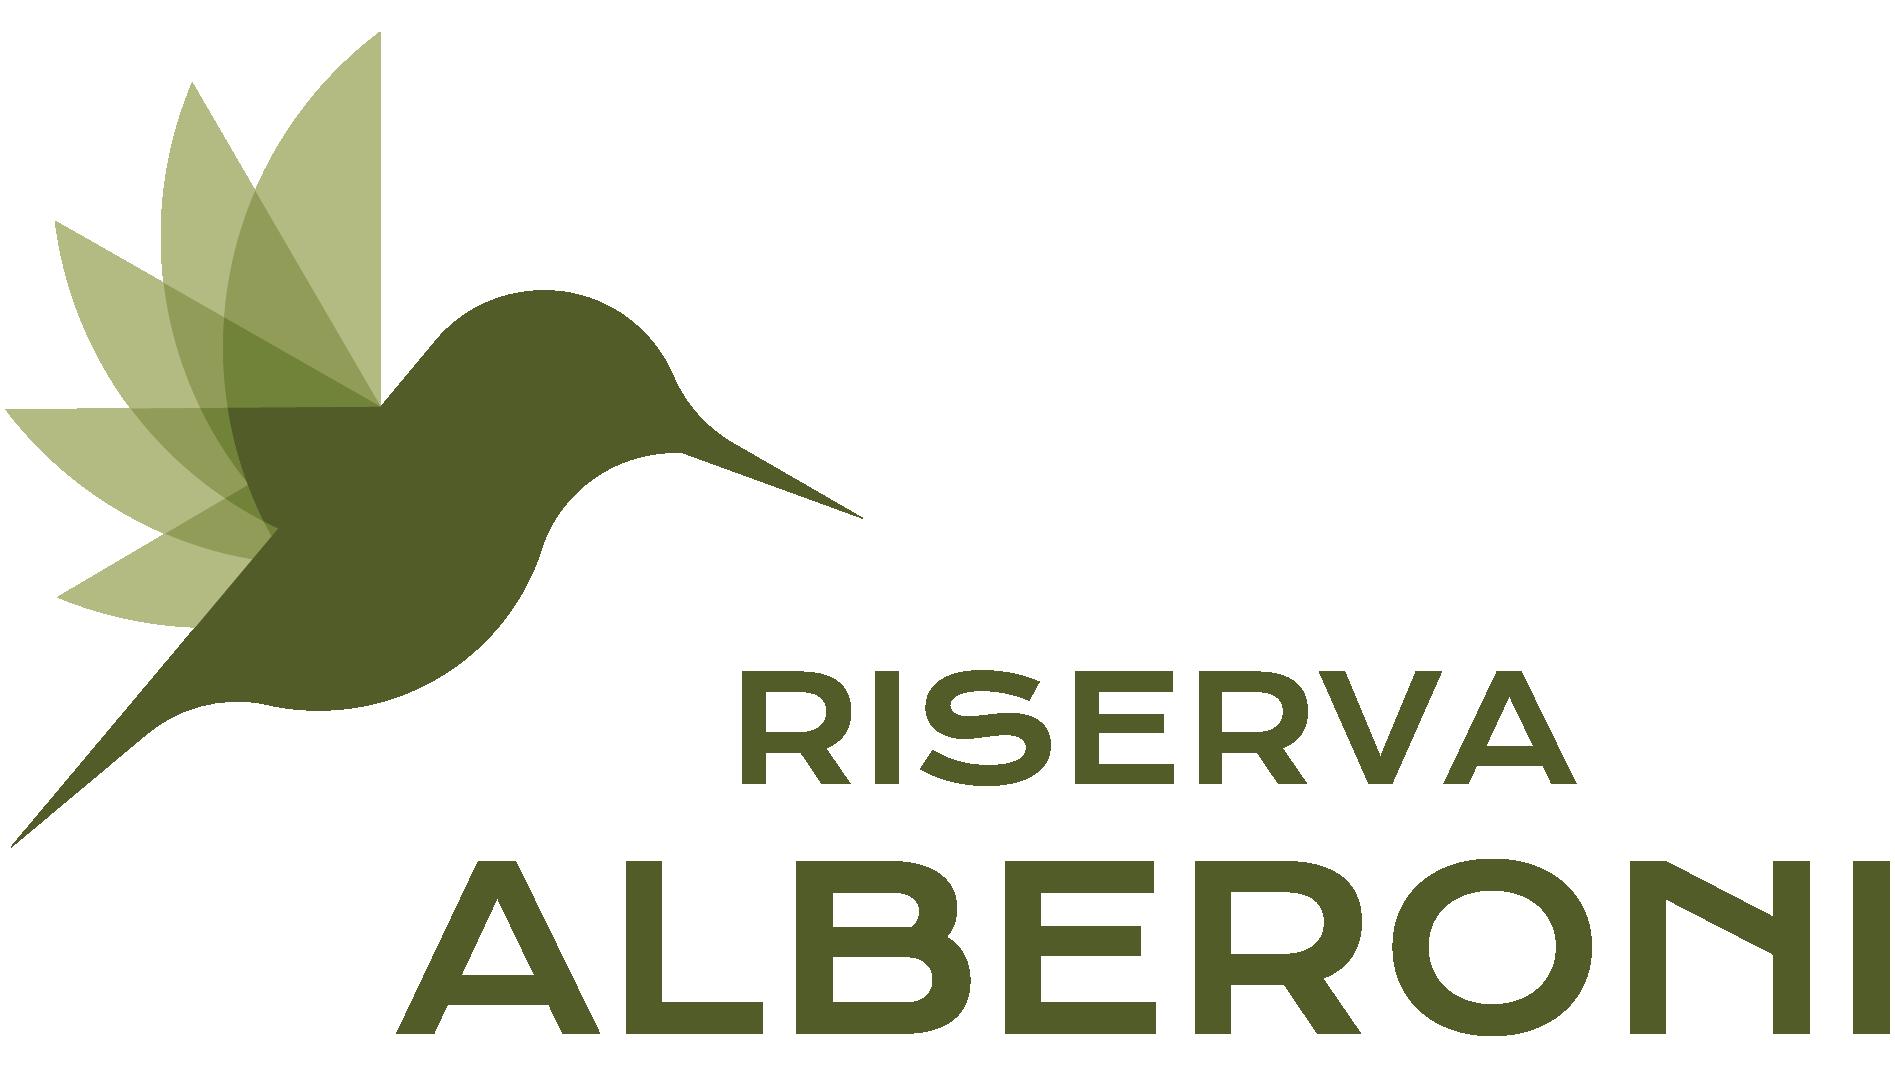 Riserva Alberoni